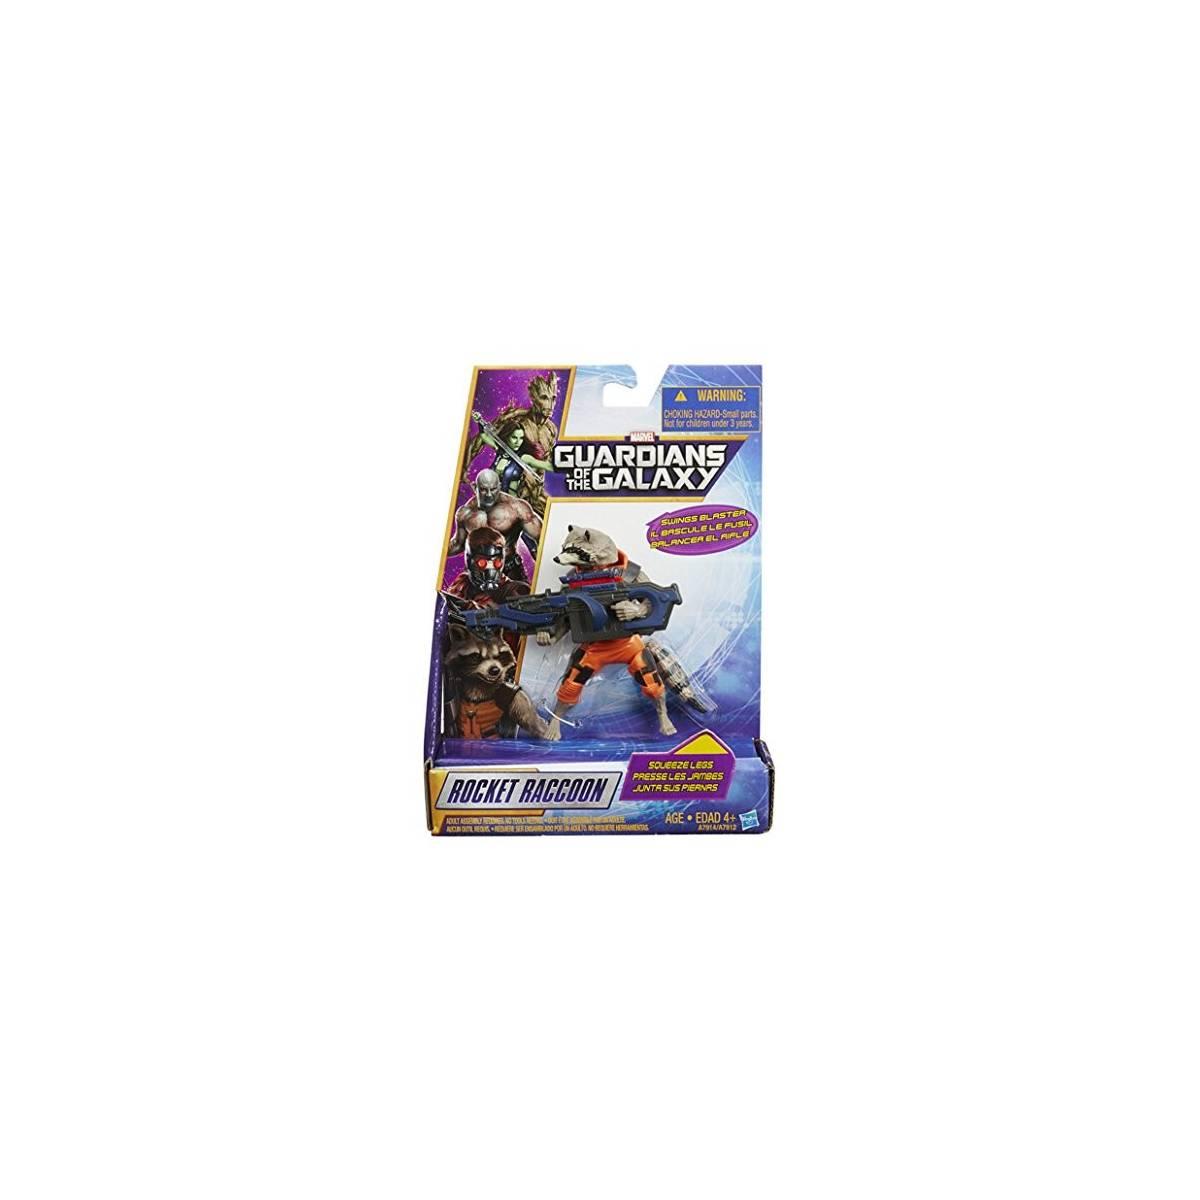 Gardiens de la Galaxie - Figurine 10 cm - Rocket Raccoon